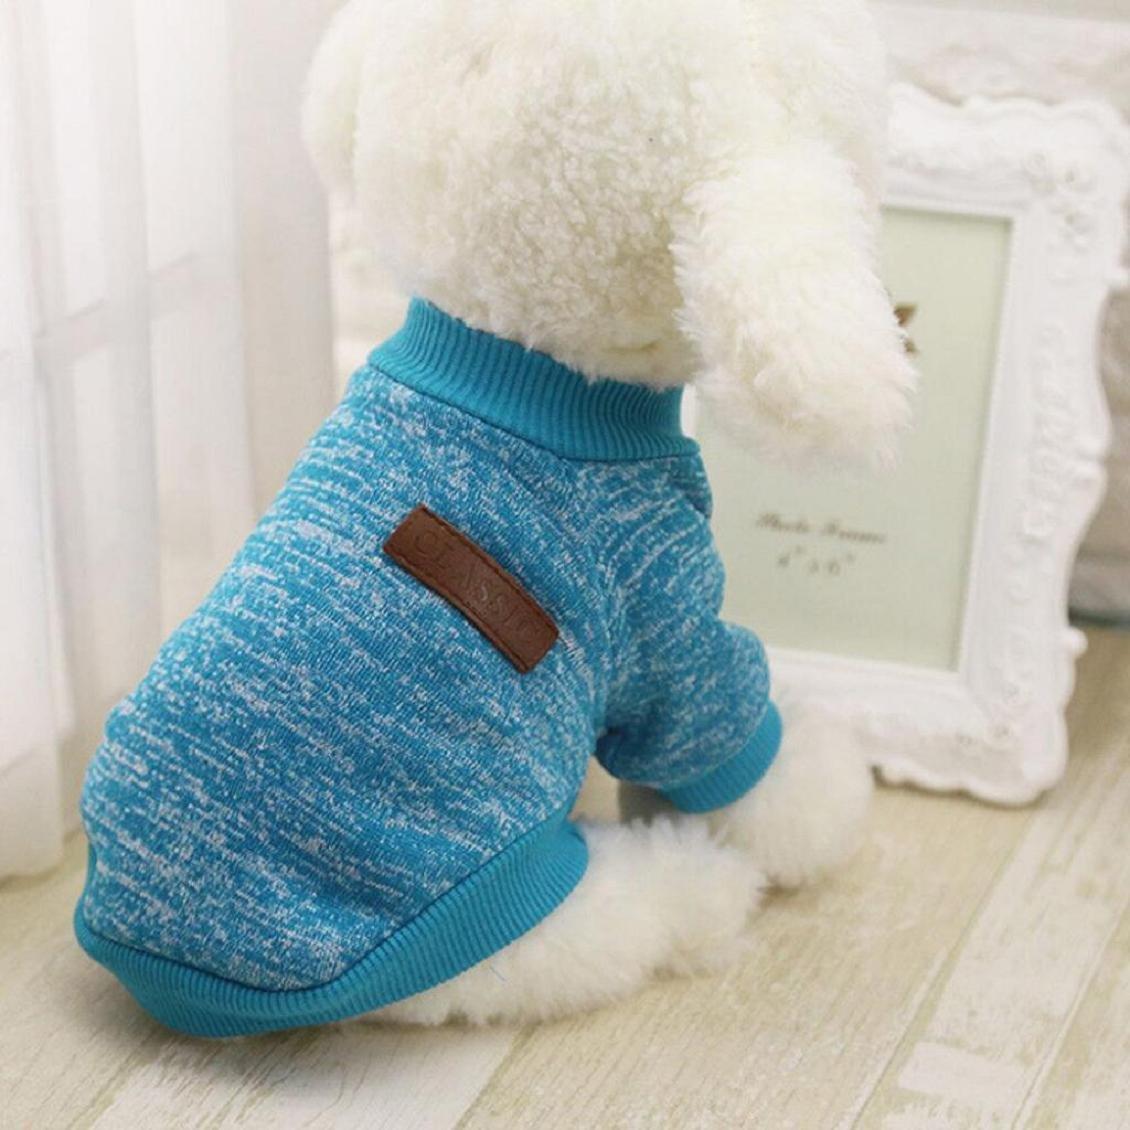 Familizo dog clothes,11 Color Pet Dog Puppy Classic Fleece Clothes Warm Sweater